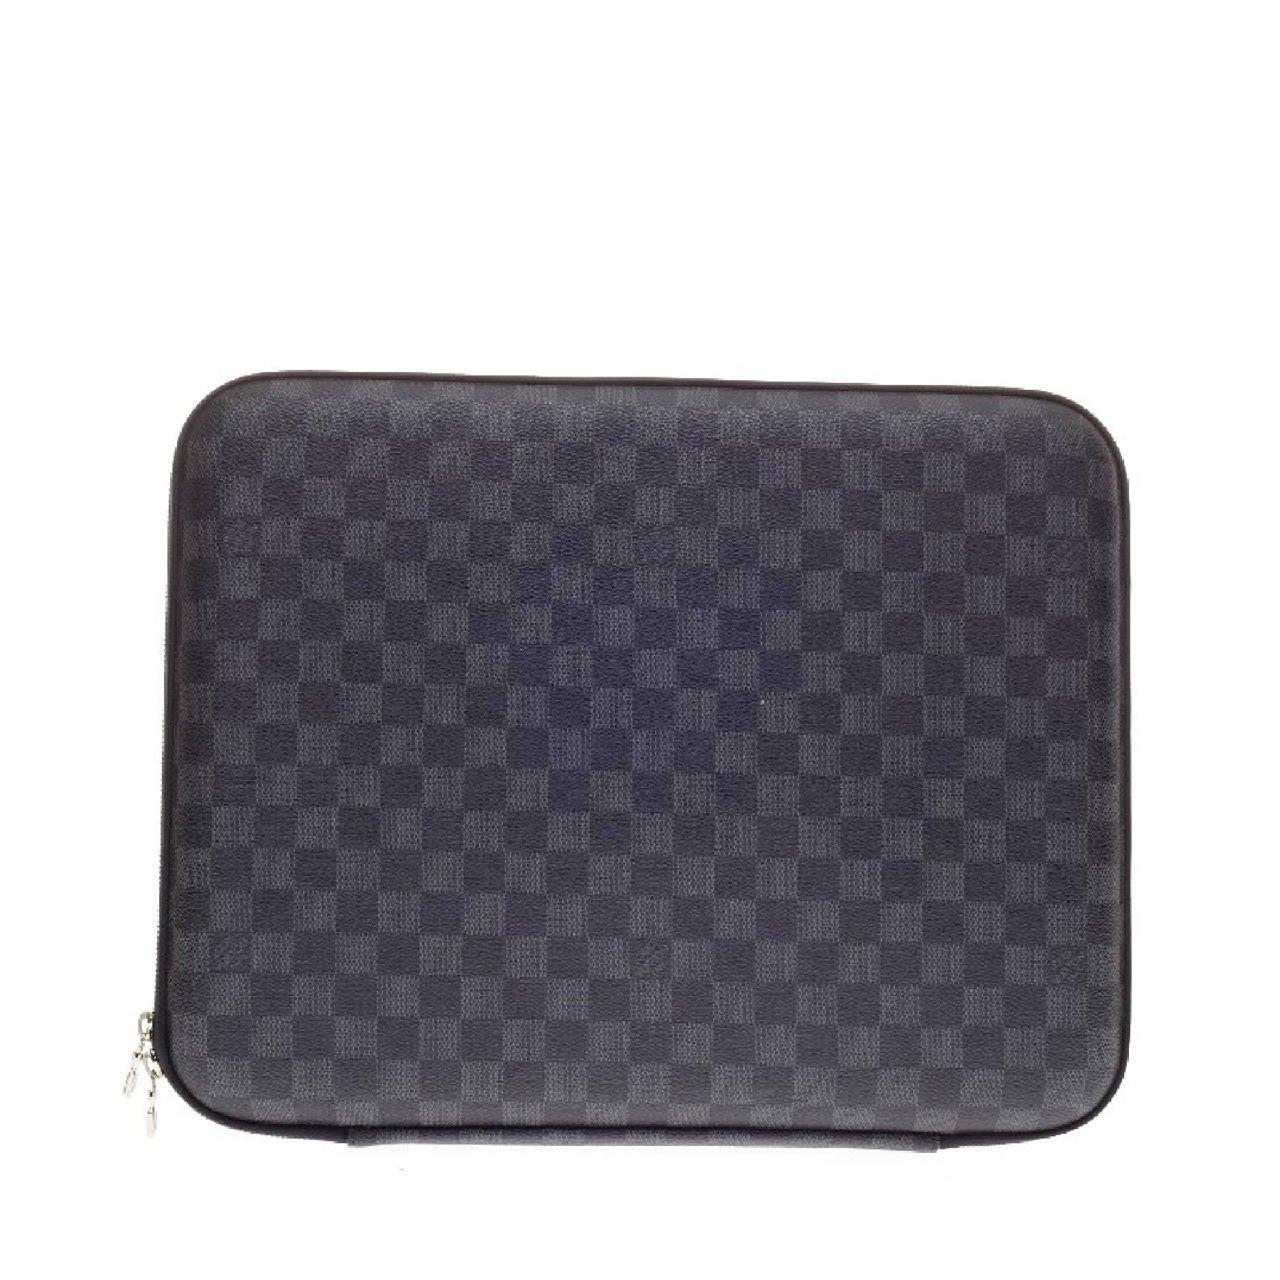 best loved db1f1 607e2 Louis Vuitton Laptop Sleeve Damier Graphite Canvas 15